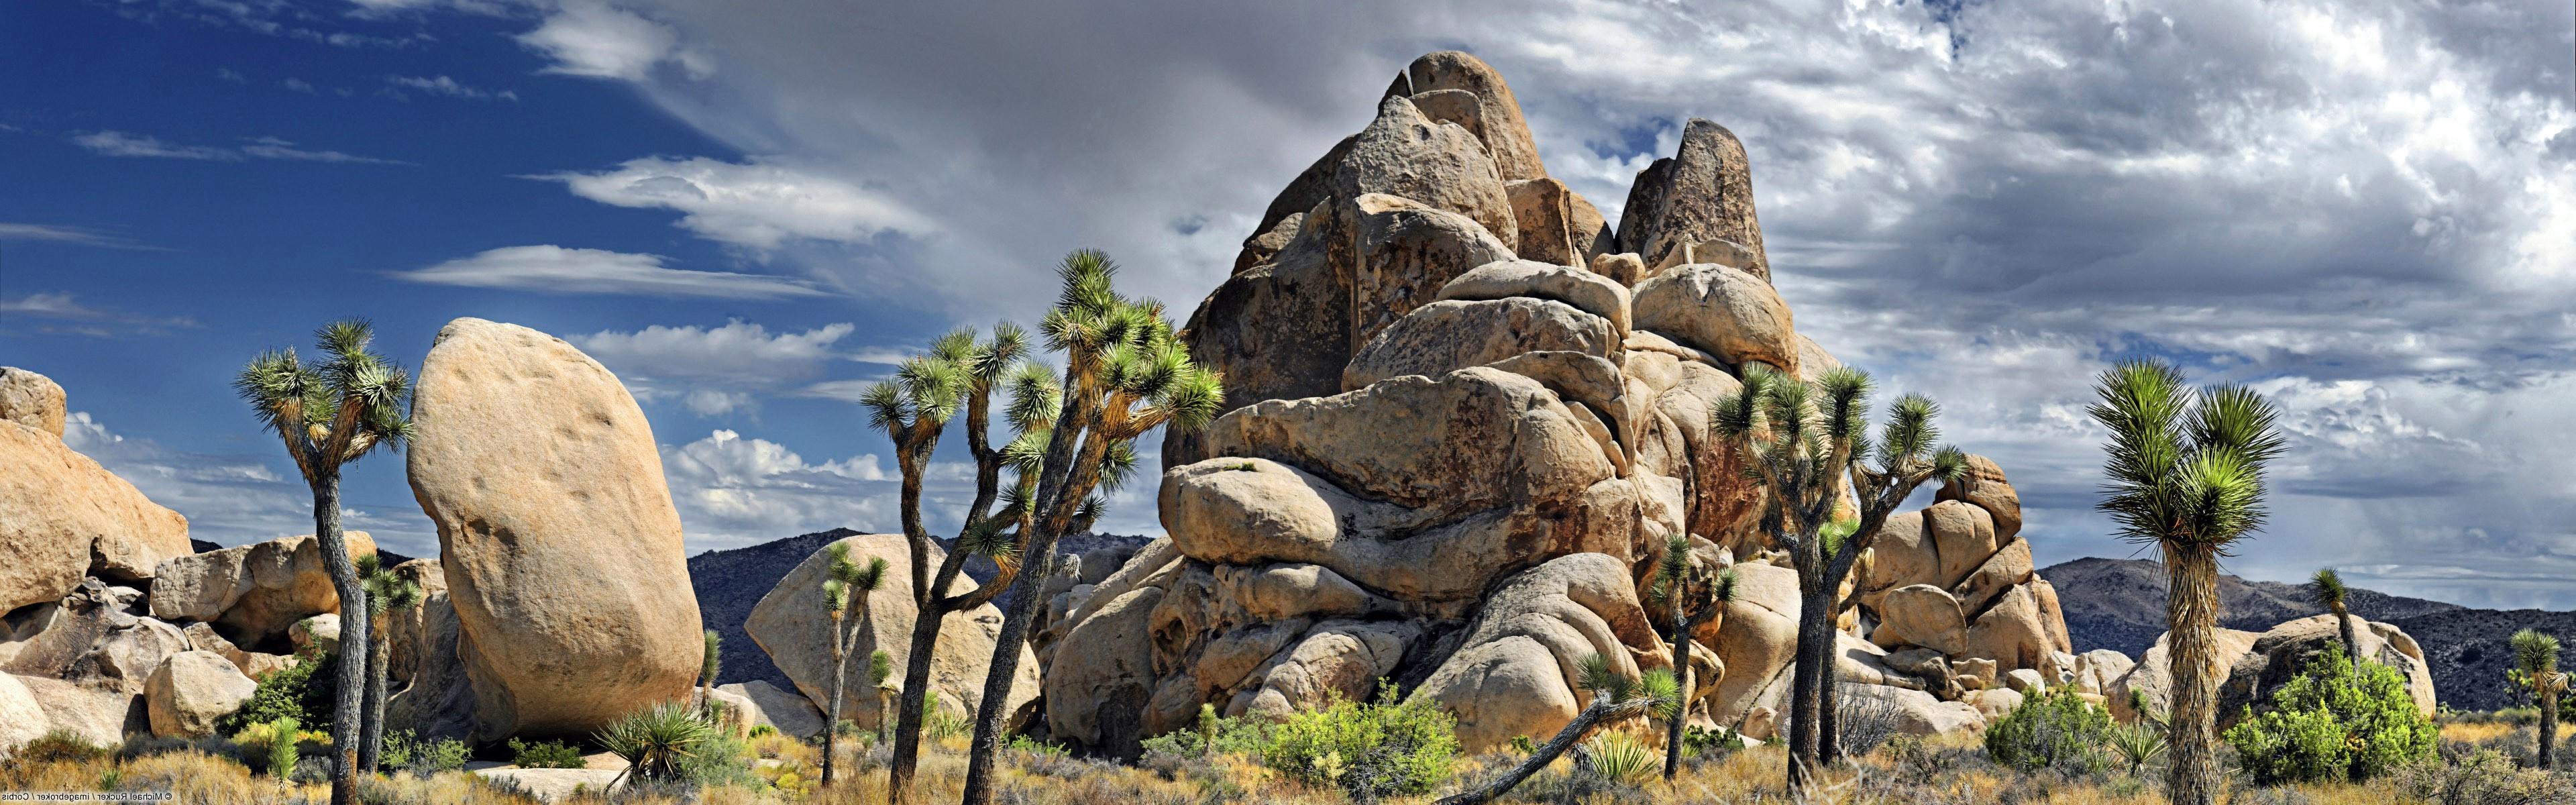 Nature Landscape Rock Joshua Tree National Park Wallpapers Hd Desktop And Mobile Backgrounds